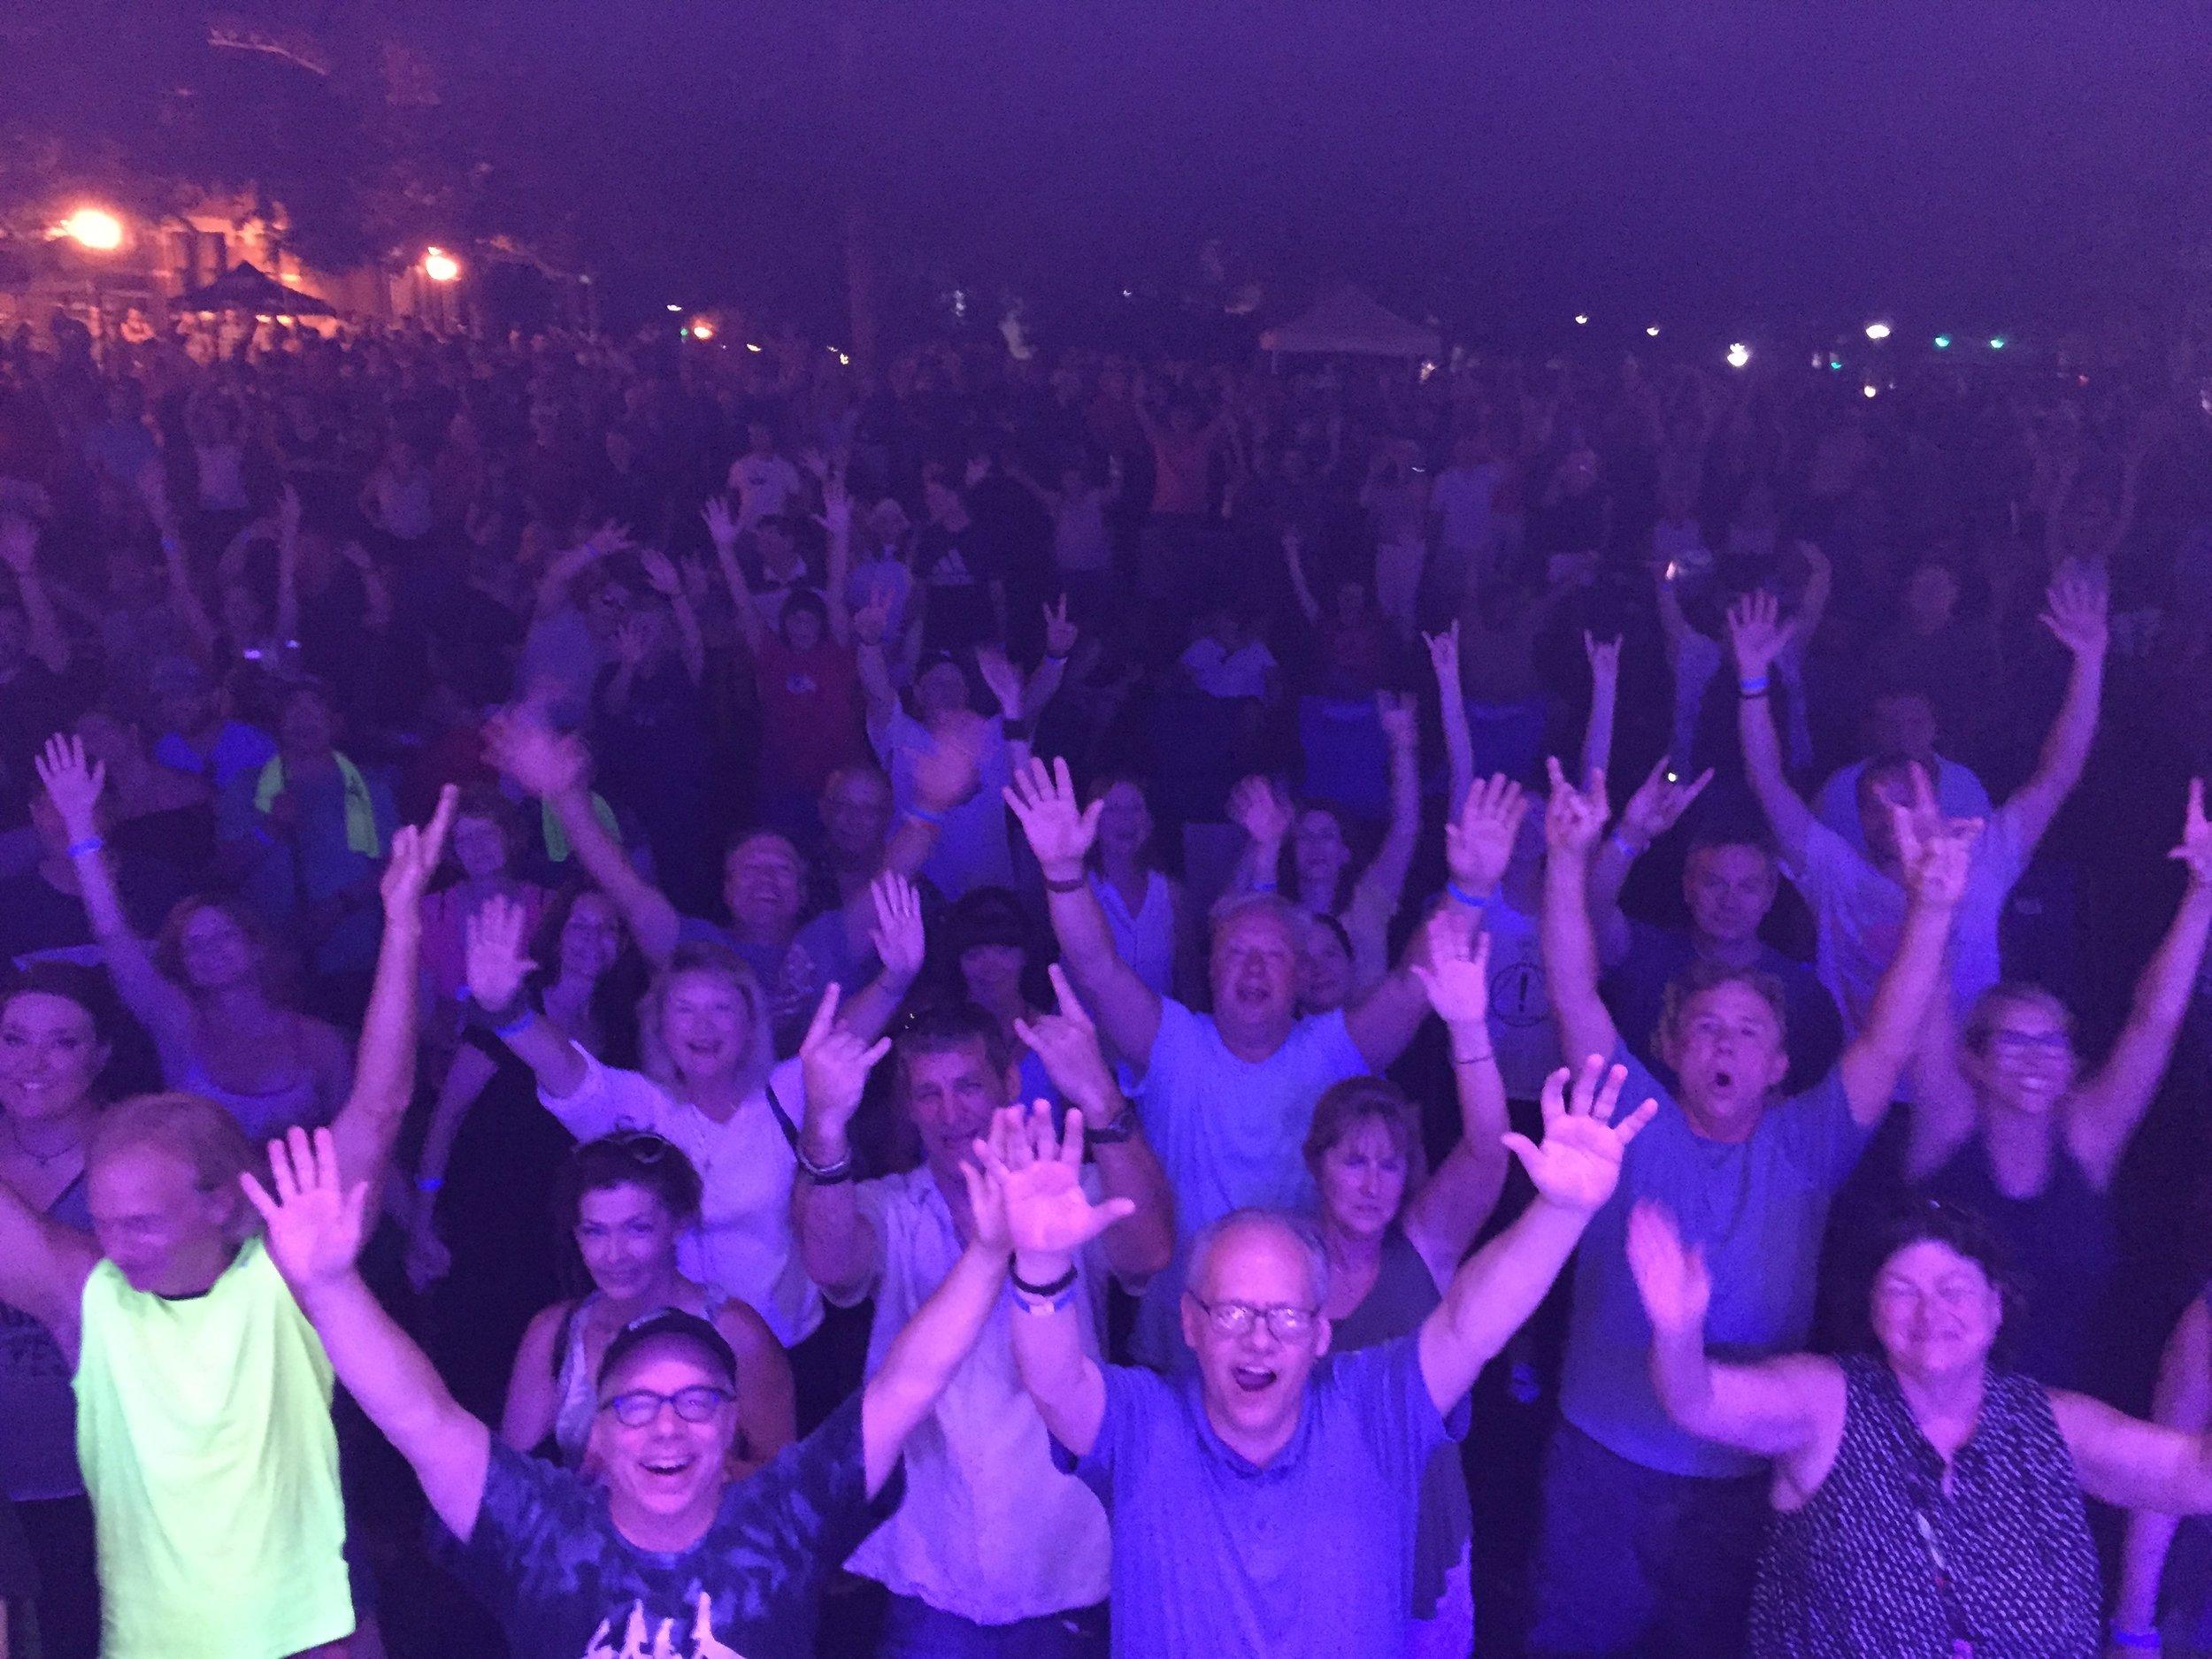 naperville crowd 2018.jpeg